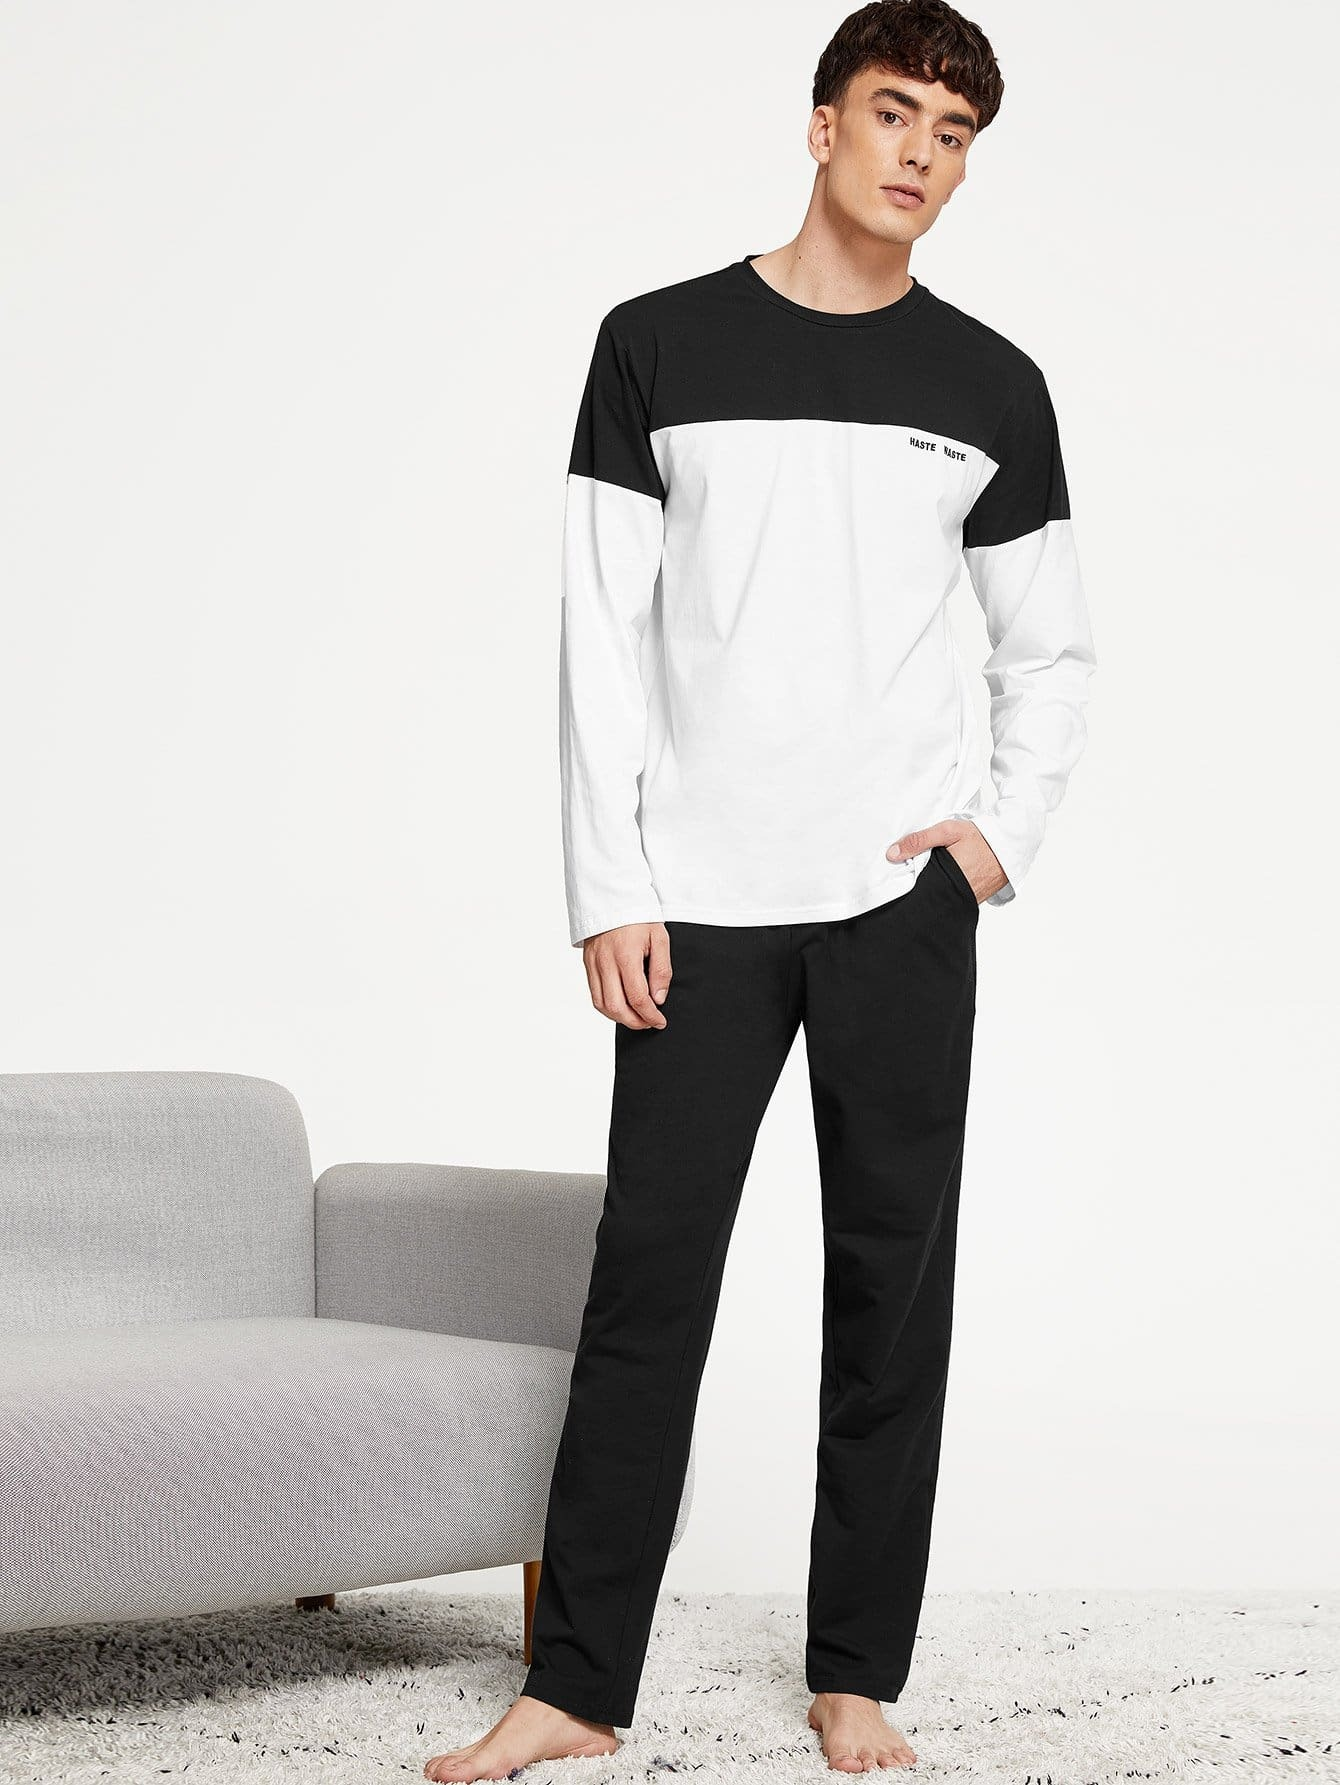 Men Colorblock Top and Slant Pocket Pants PJ Set Men Colorblock Top and Slant Pocket Pants PJ Set